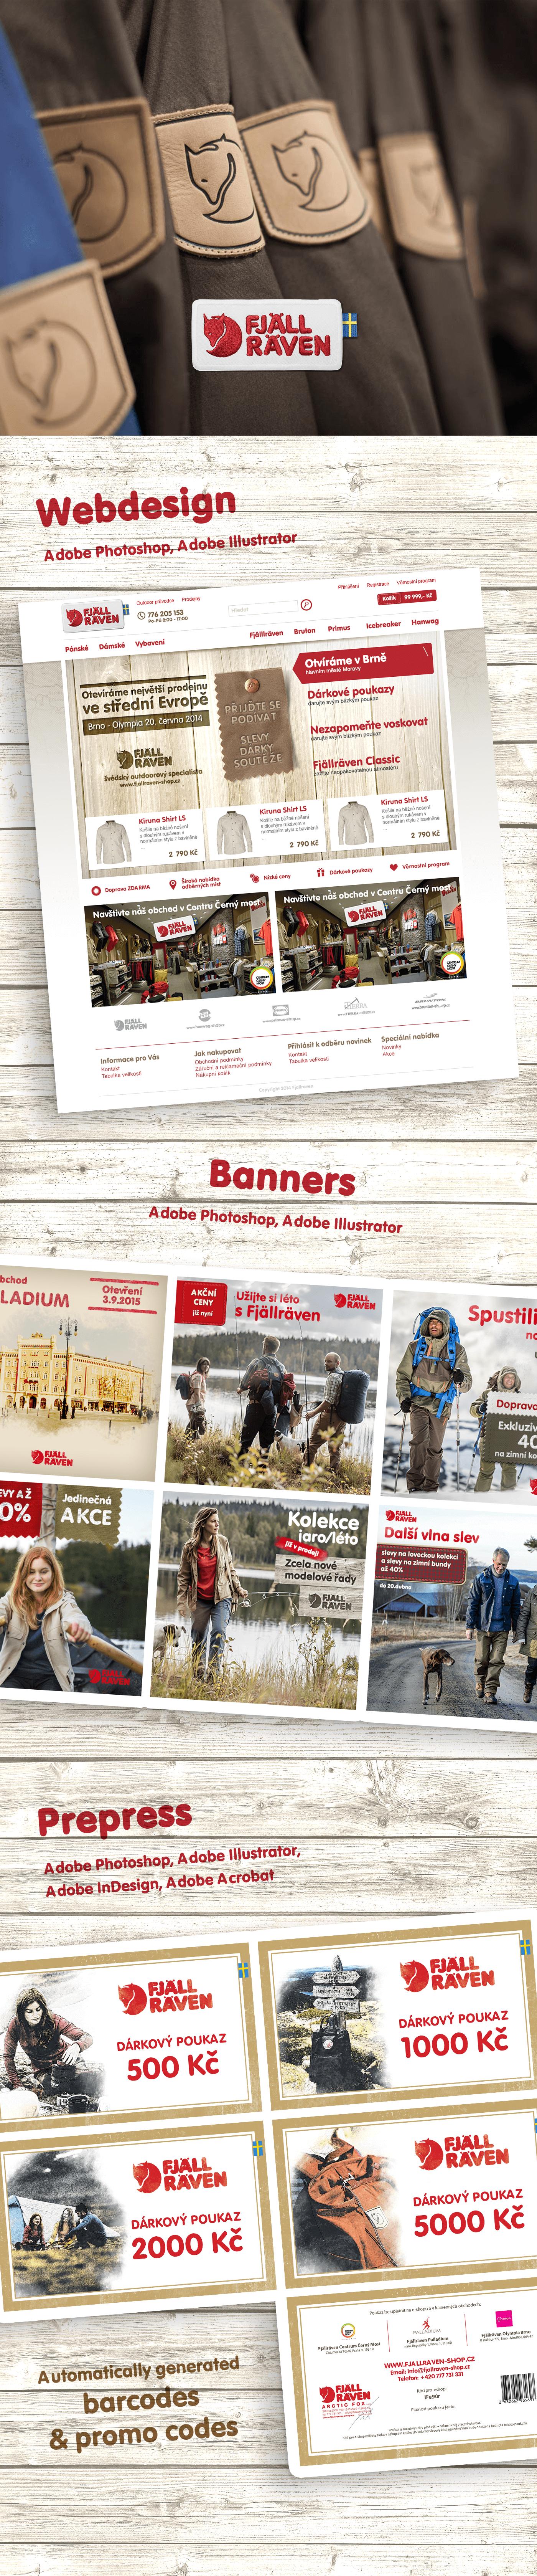 Adobe Portfolio eshop Webdesign prepress vector banners